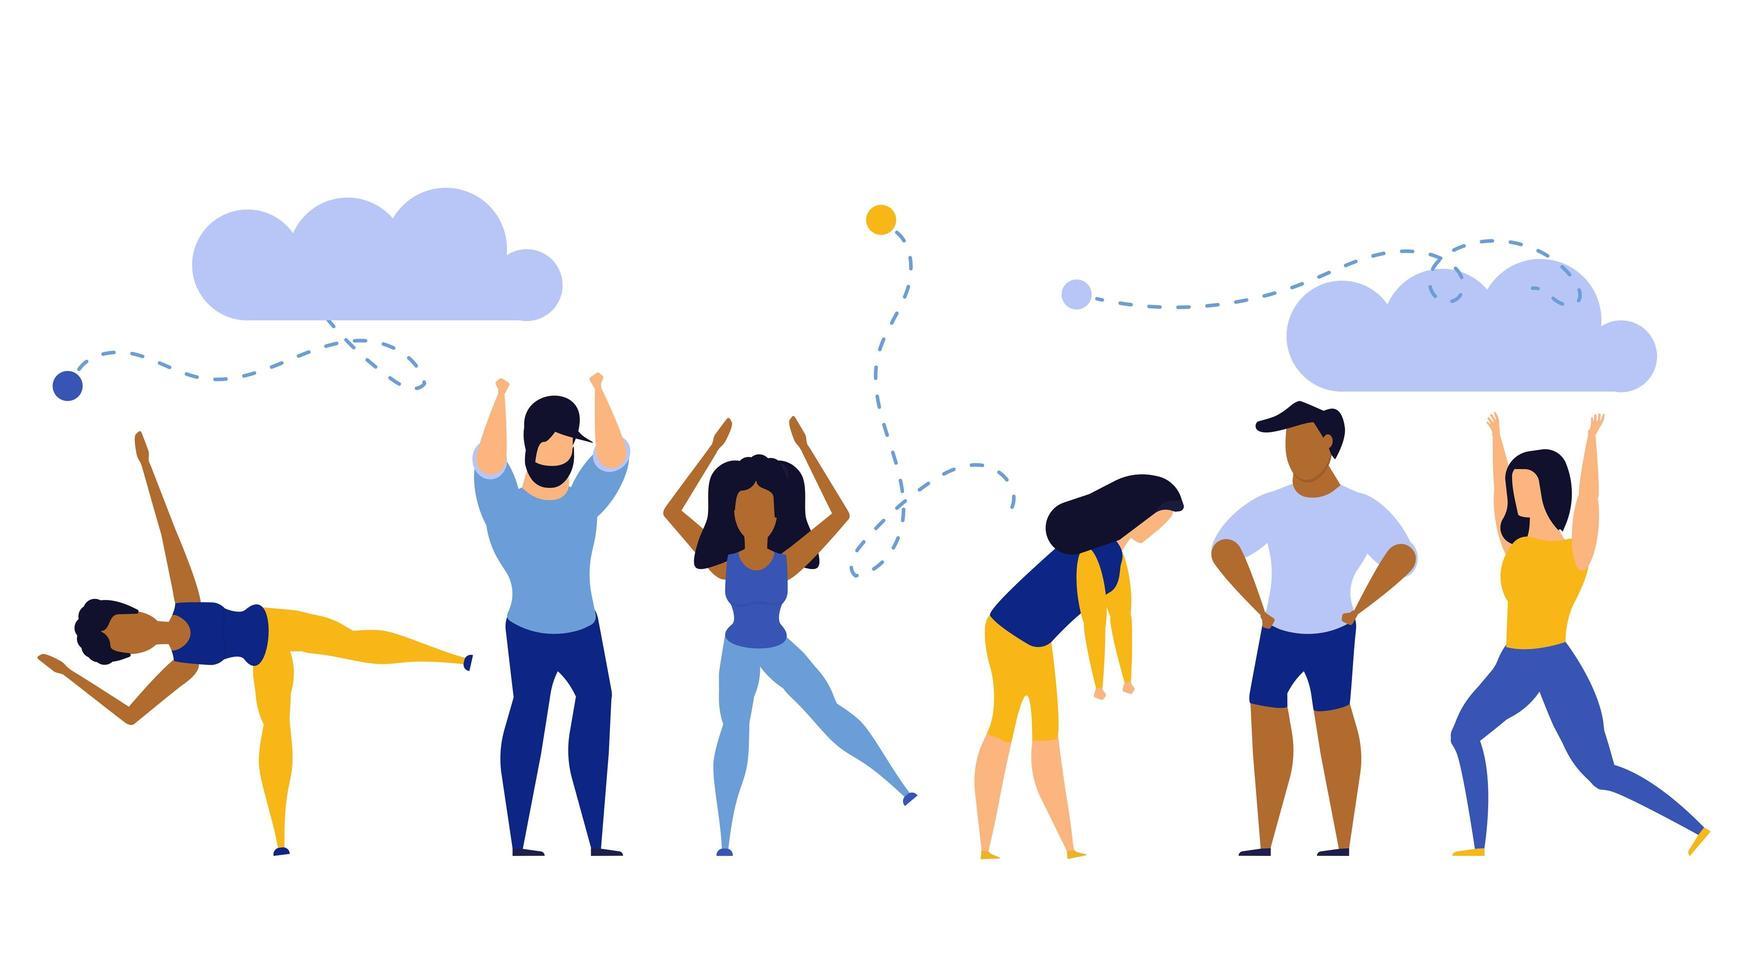 Achievement exercise flat health body mind concept